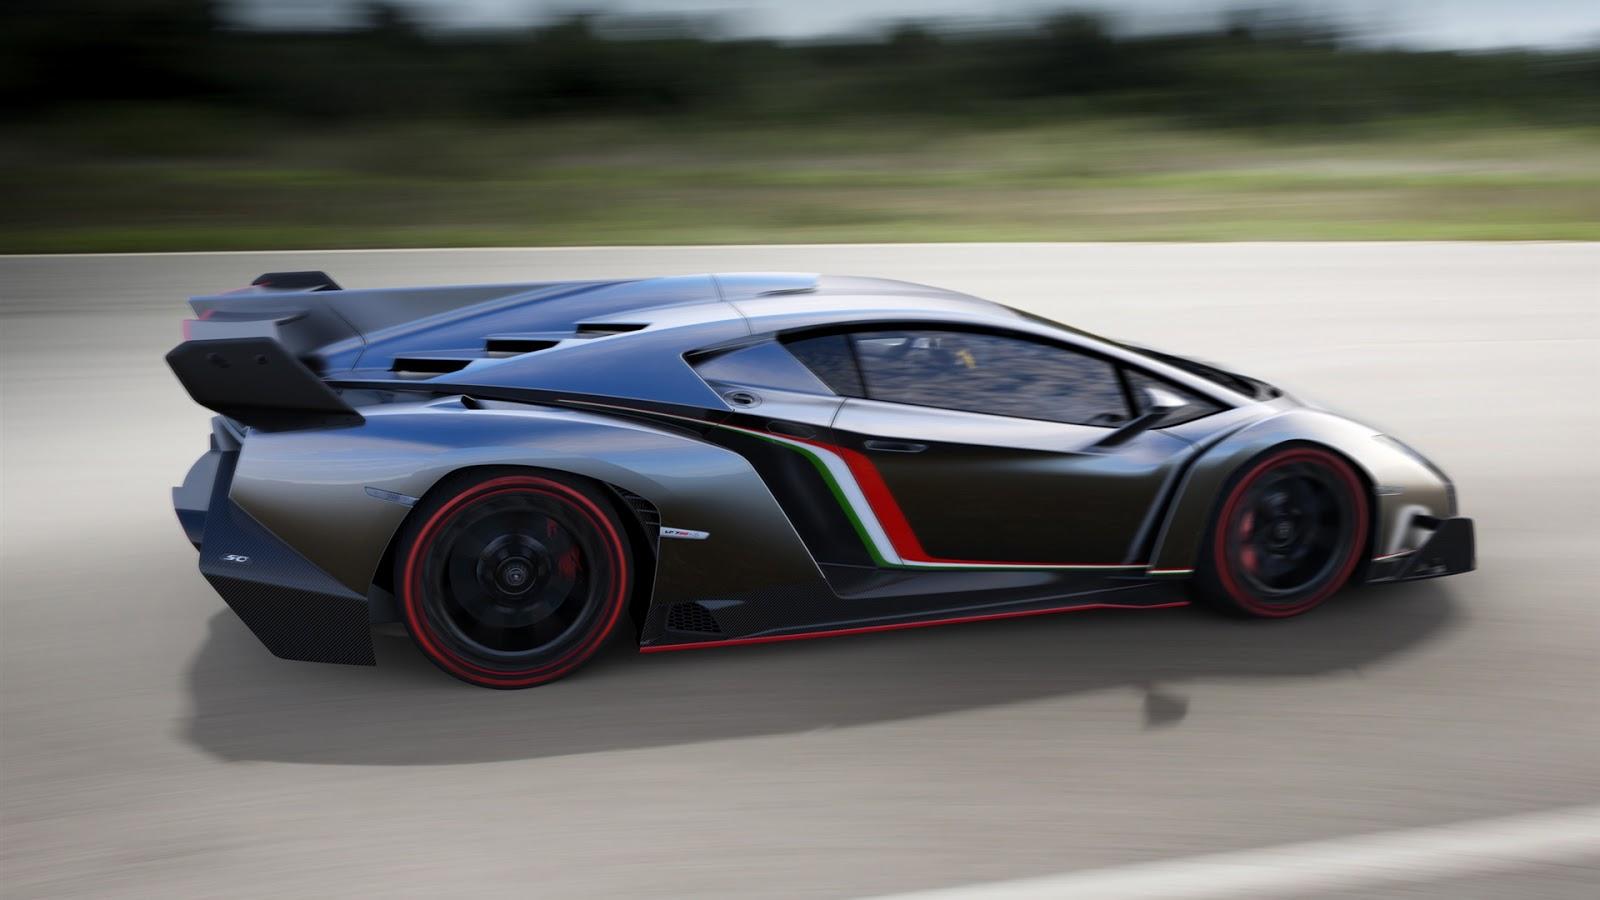 Supercar Lamborghini Veneno | Full HD Desktop Wallpapers 1080p